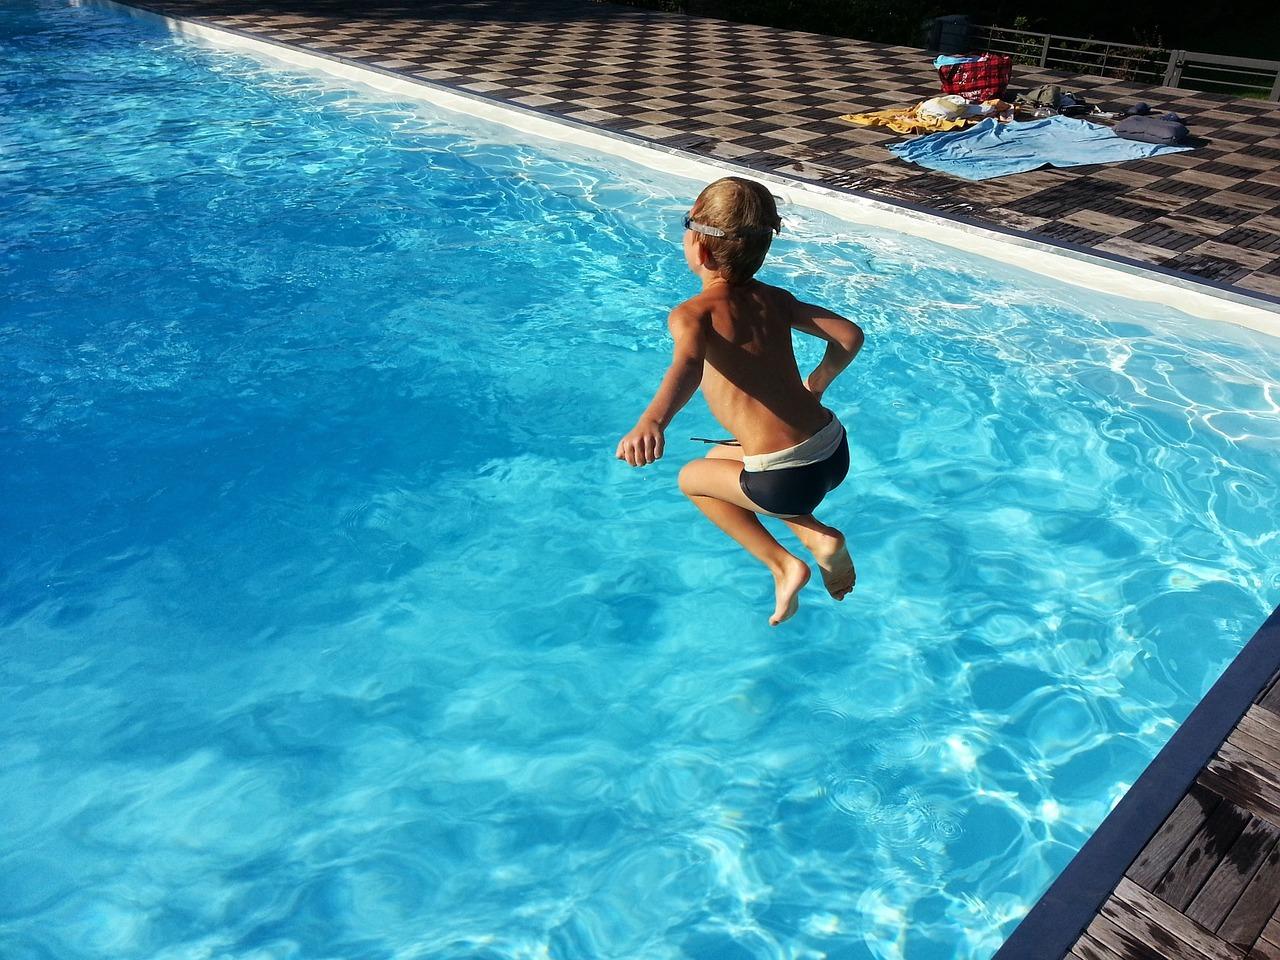 Swimming Pool Contractor In Houston Tx 713 478 0625 Aquatics Solution Services